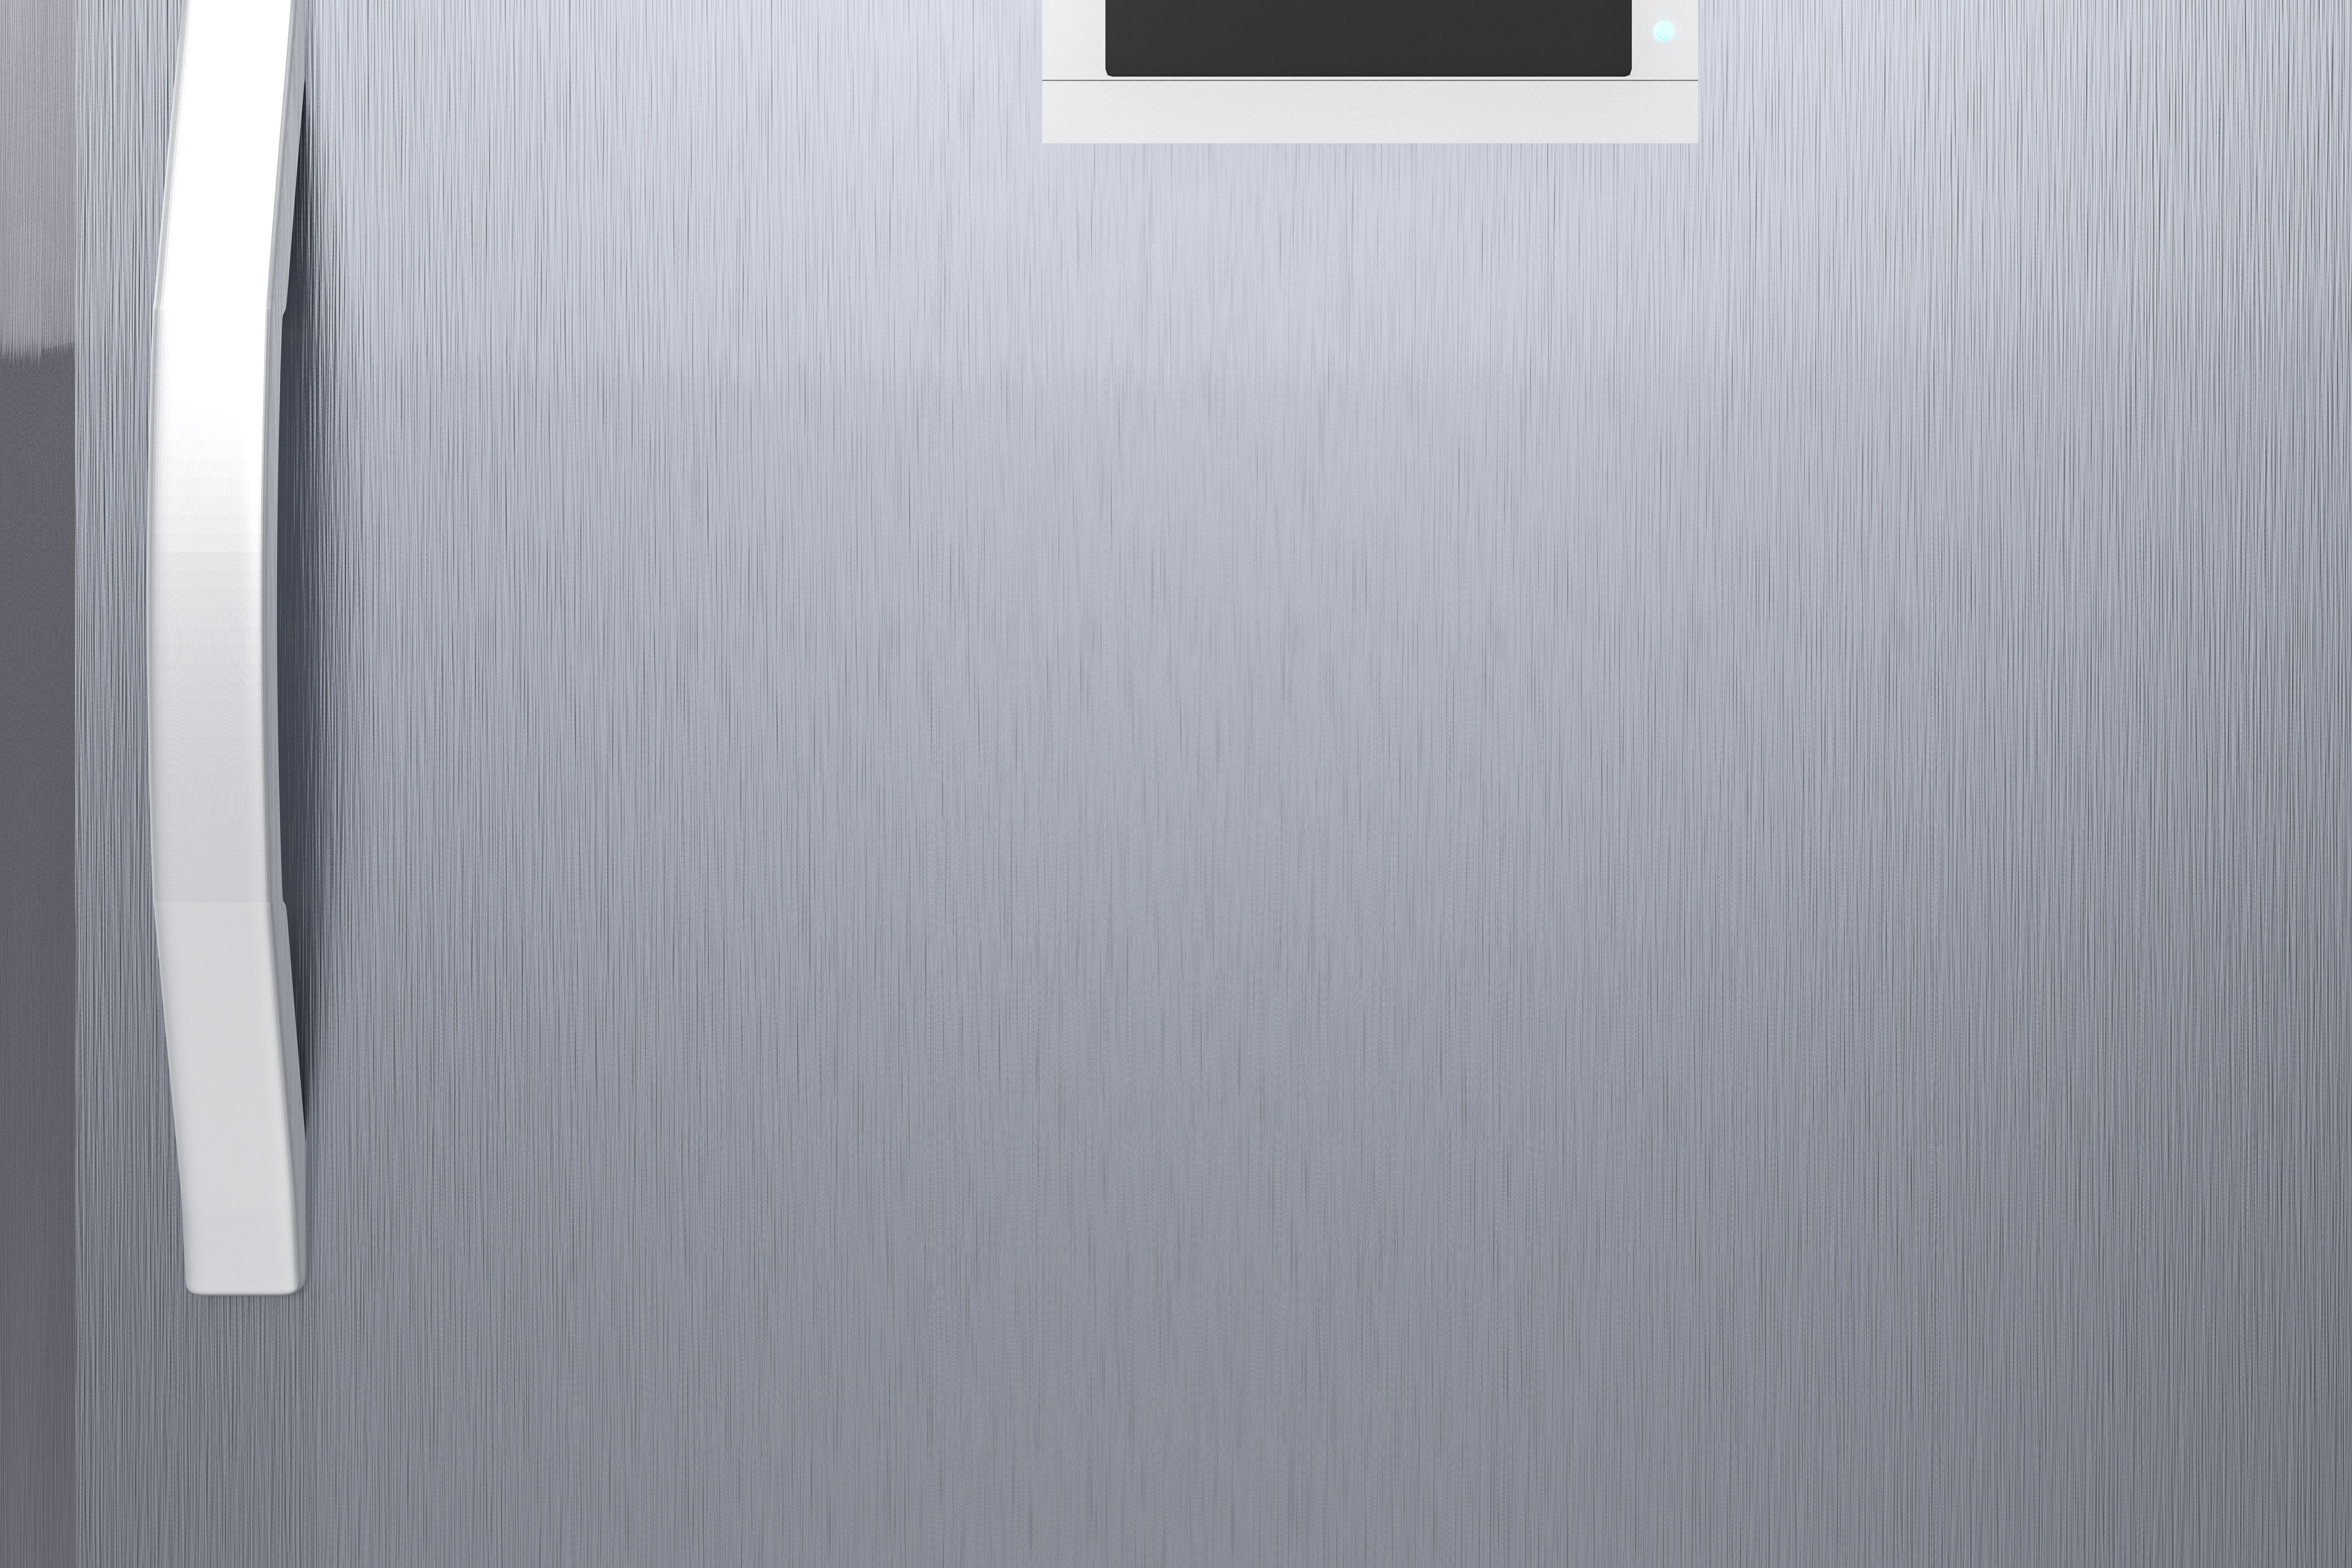 How To Troubleshoot Frigidaire Refrigerator Problems